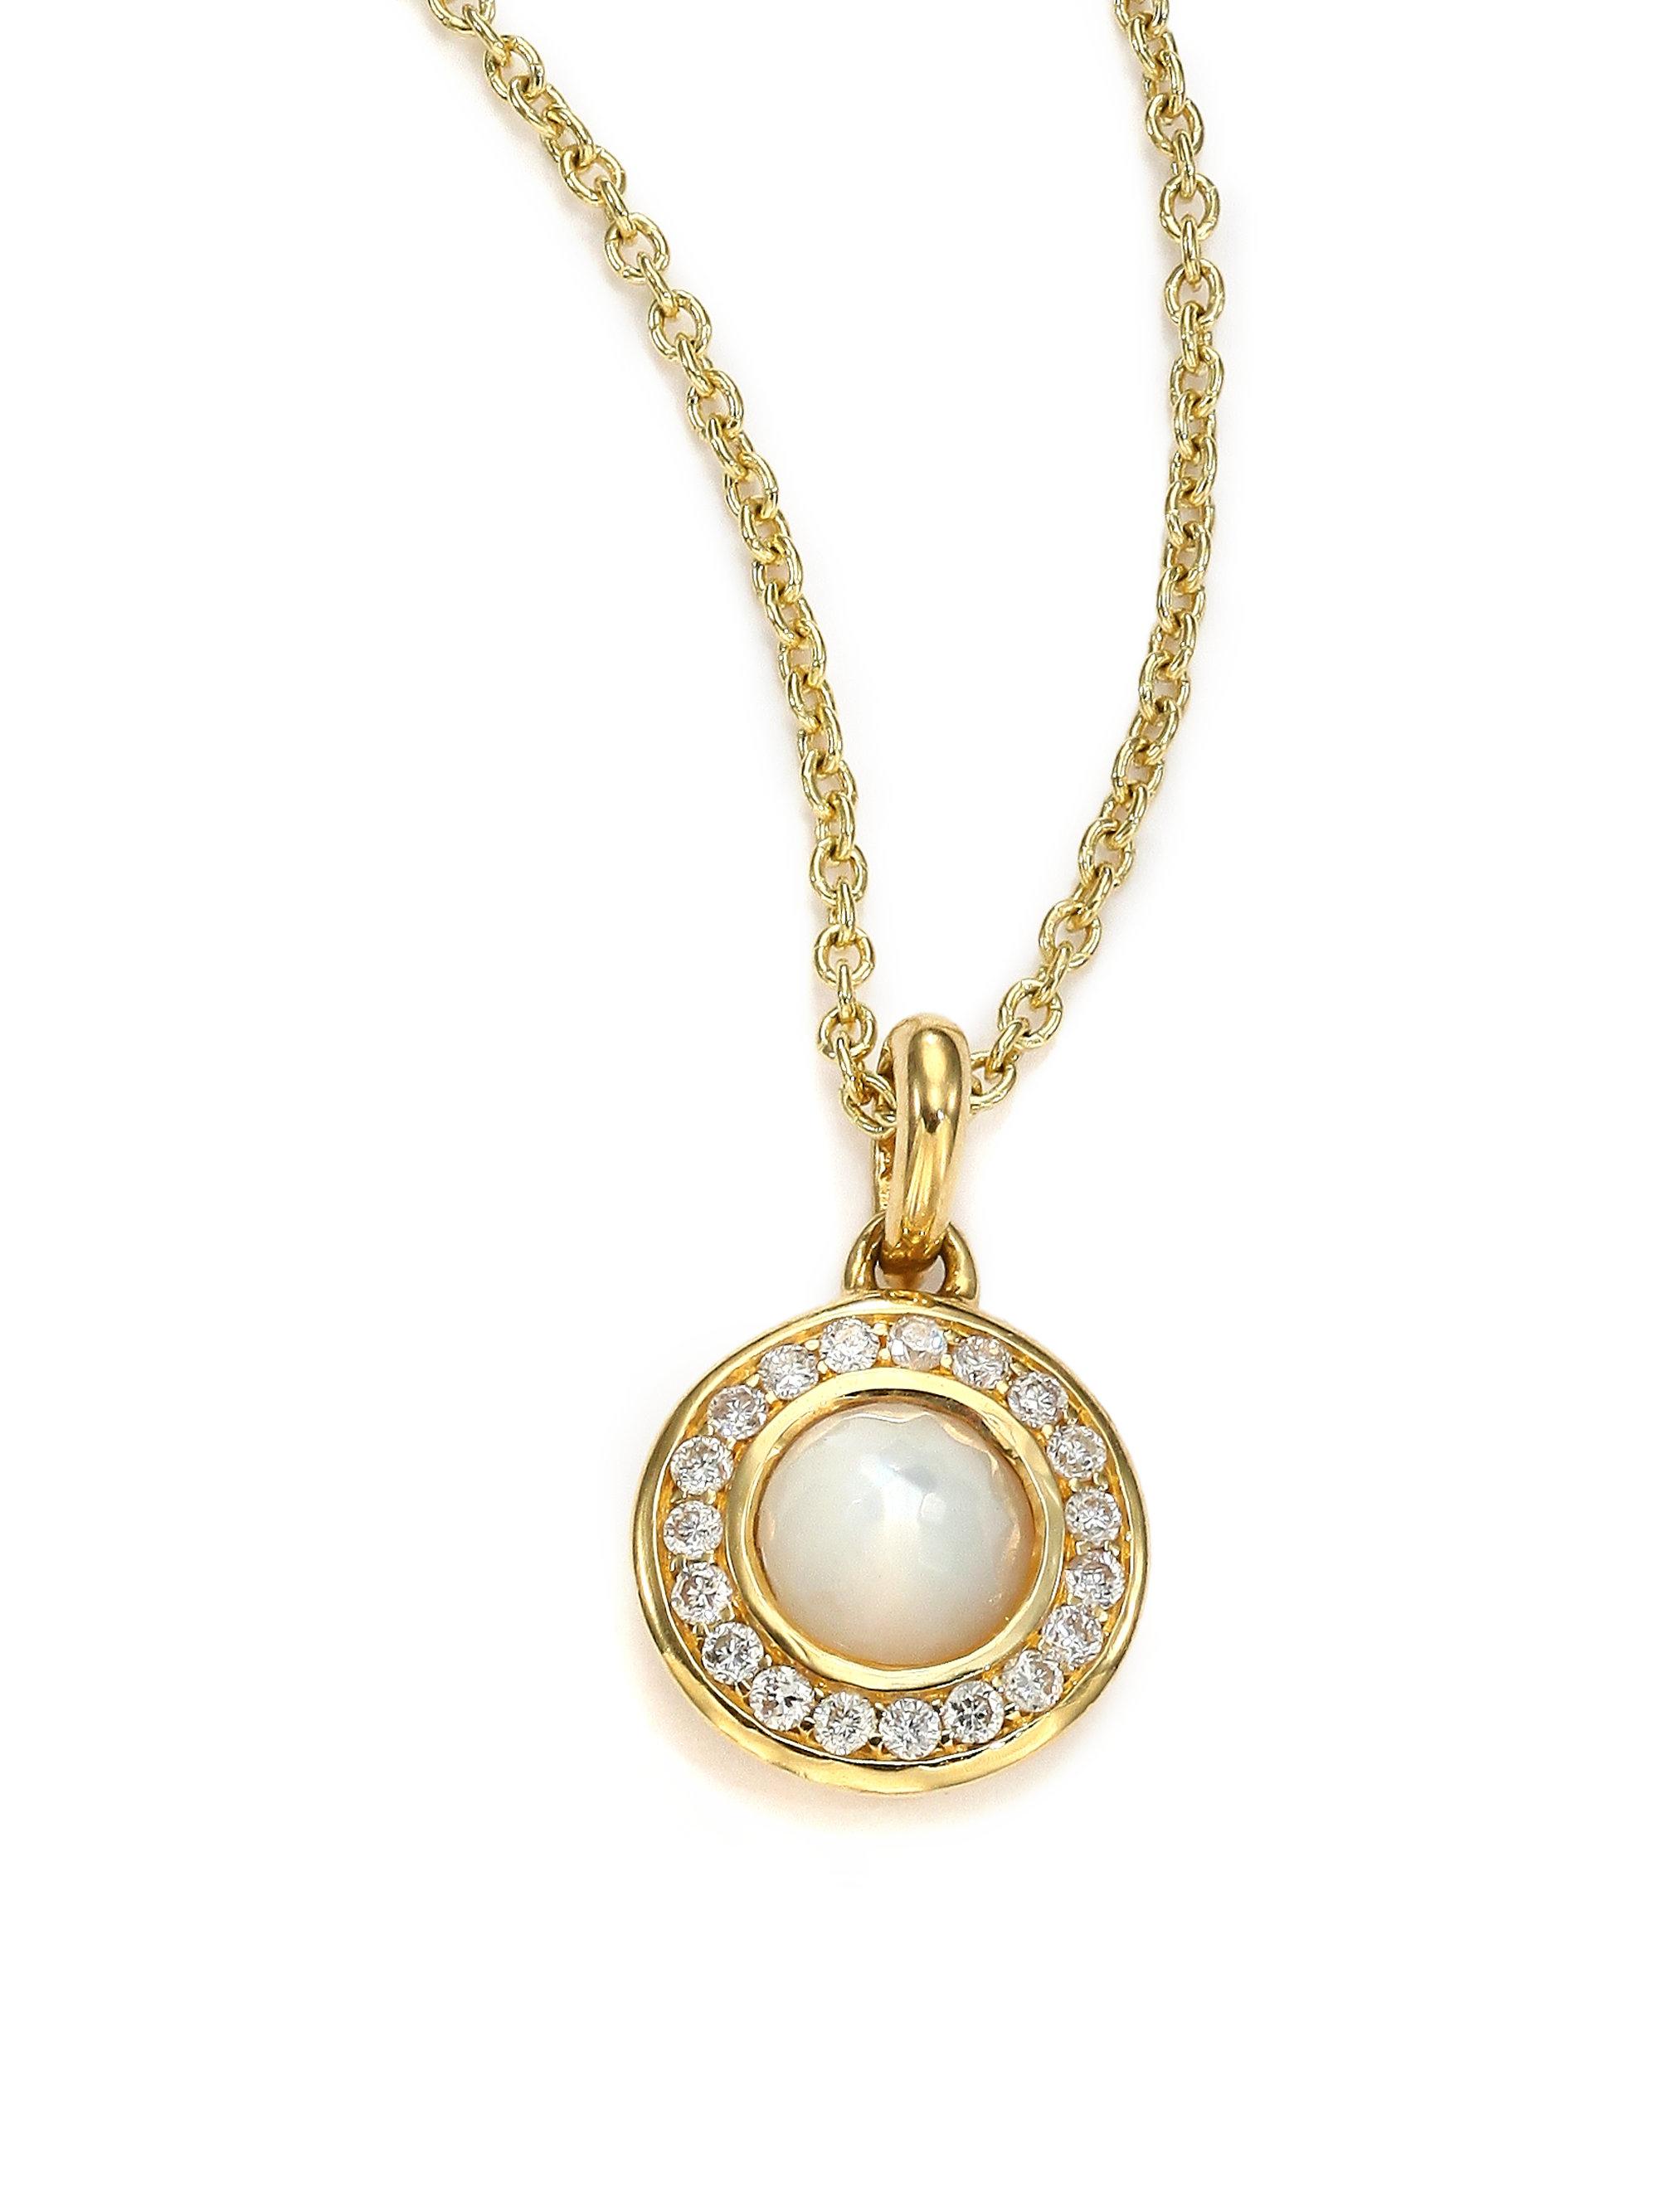 Lyst - Ippolita Lollipop Mother-of-pearl, Diamond & 18k ...